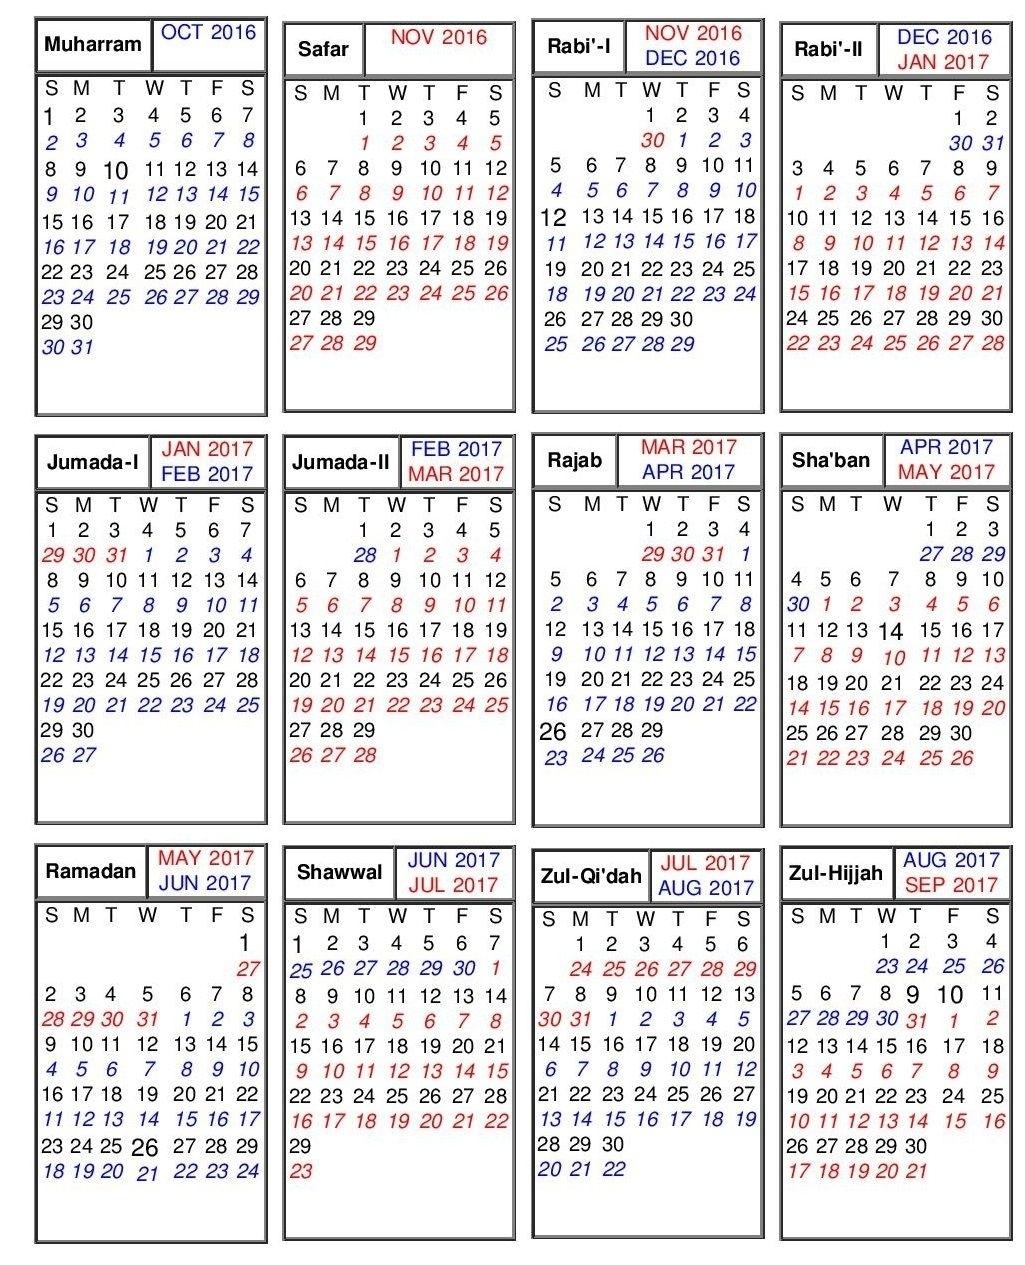 Hijri Calendar 1438 With Gregorian Calendar | Template Calendar with Hijri Calendar 1438 With Gregorian Calendar